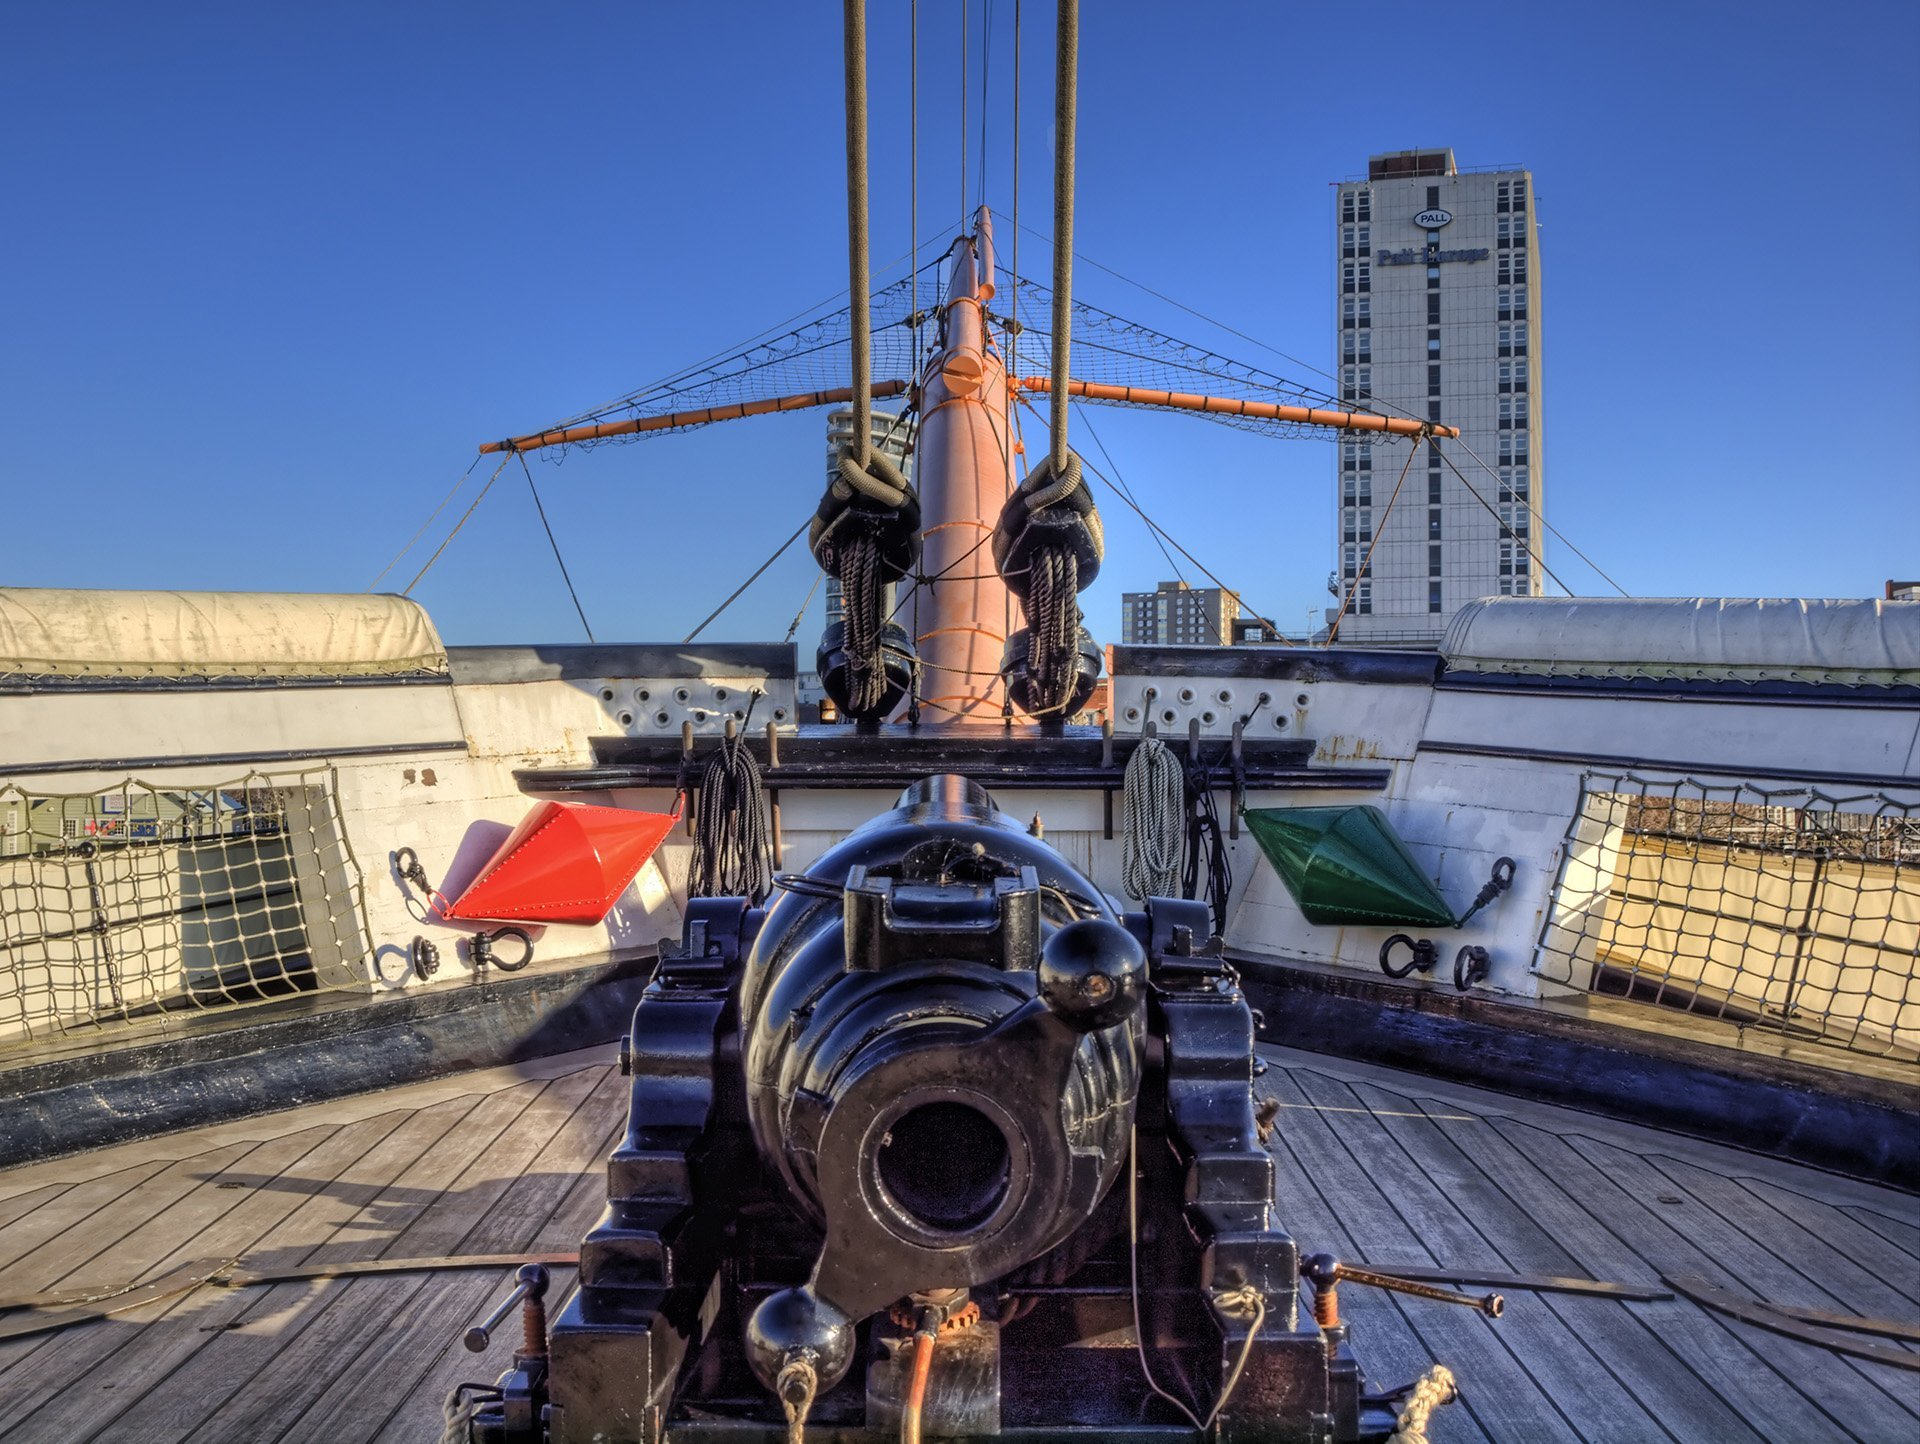 victoria ironcland – savaş gemisi